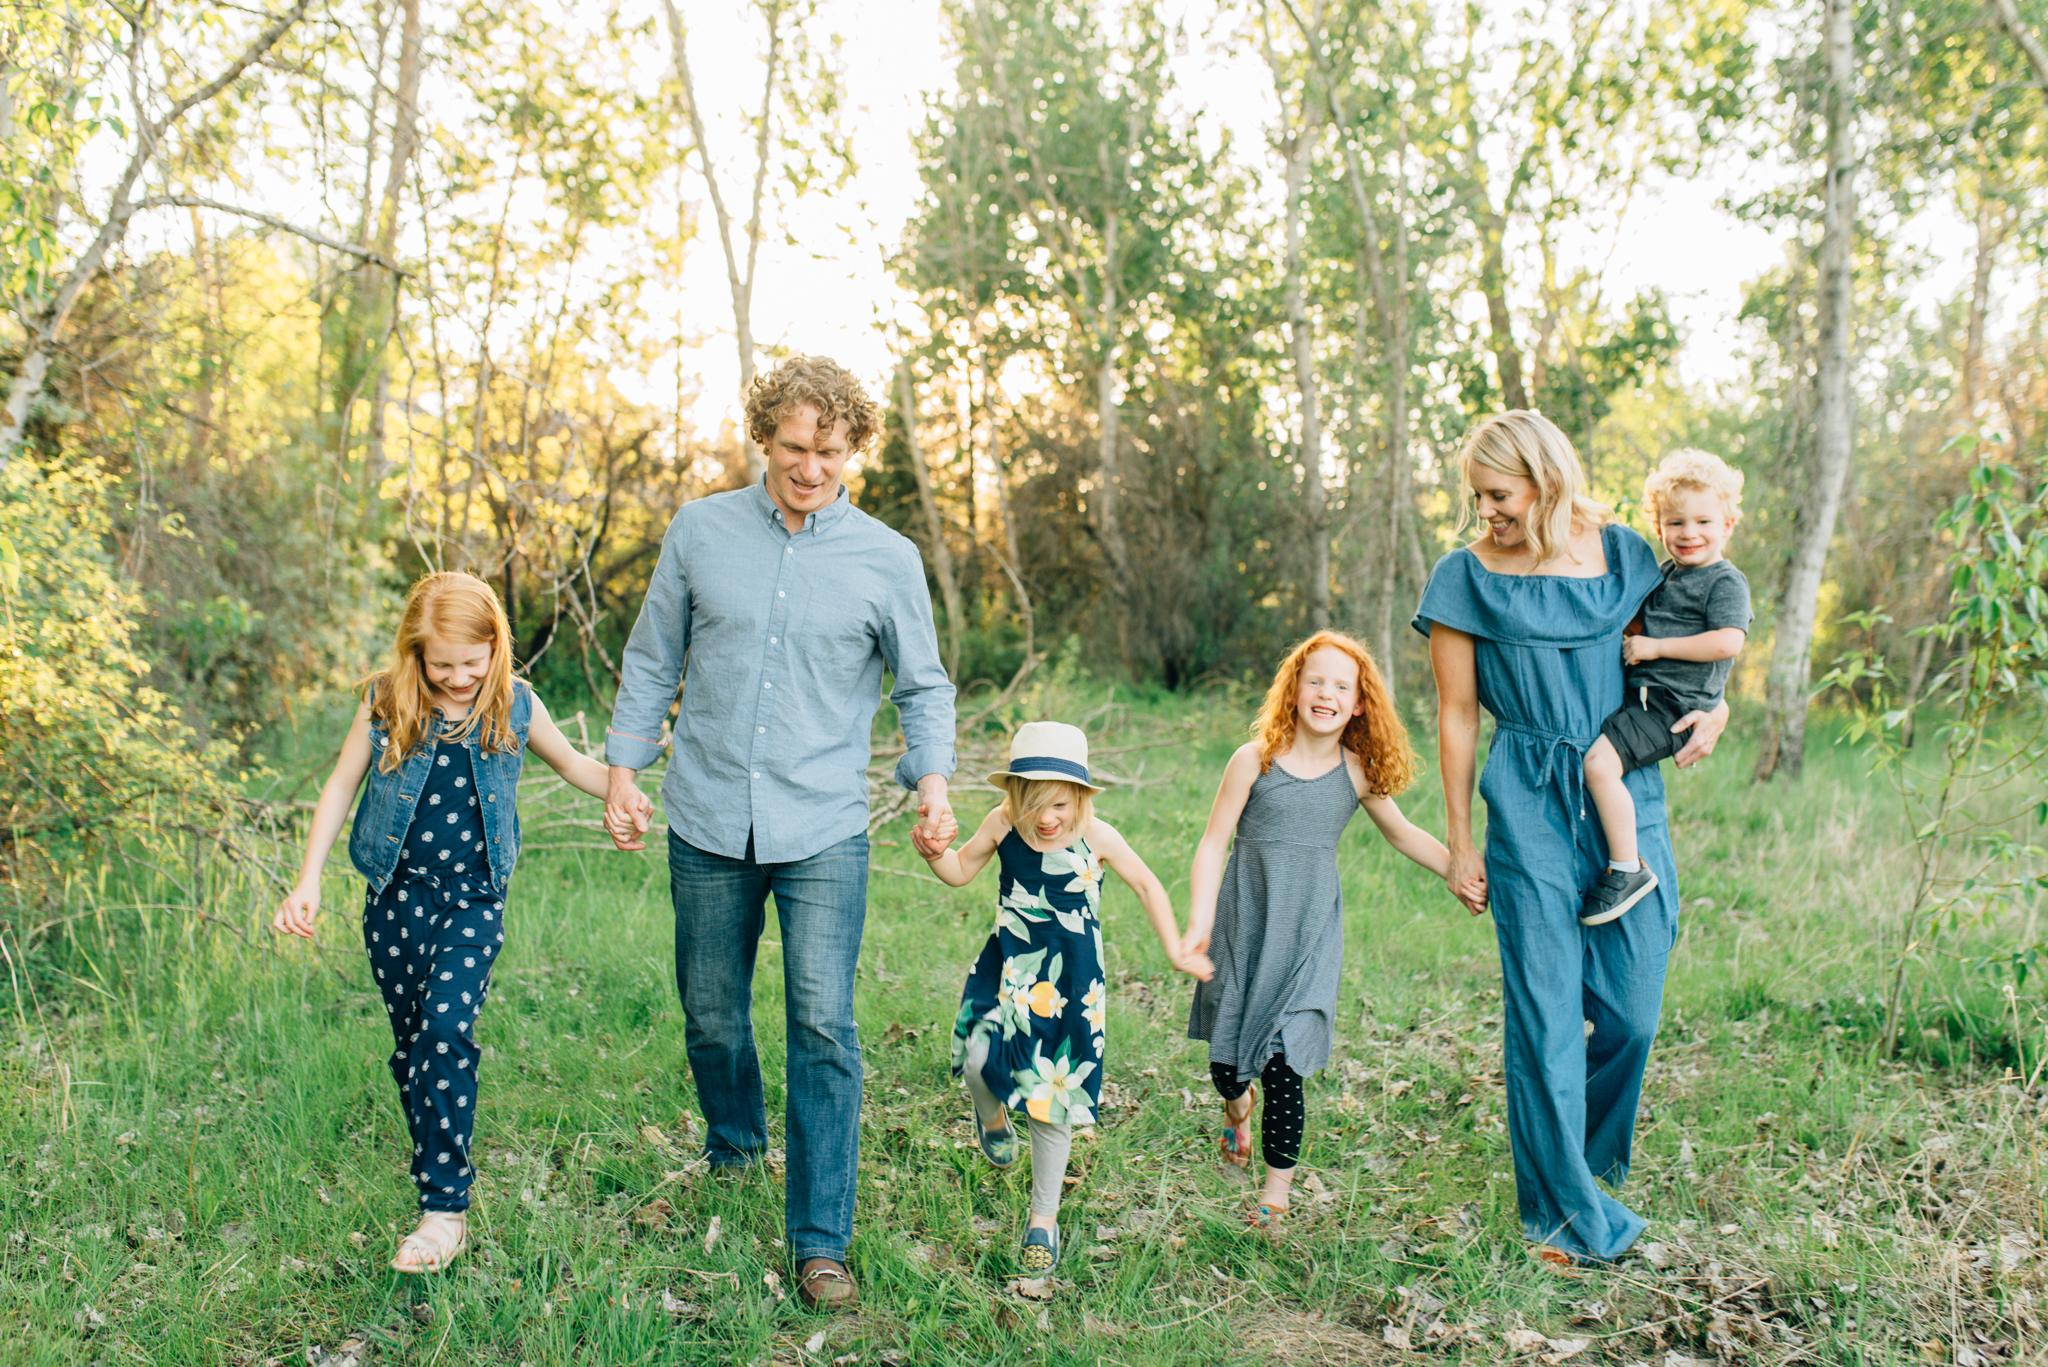 boise family lifestyle session| barber park | boise family photographer | family walking and smiling